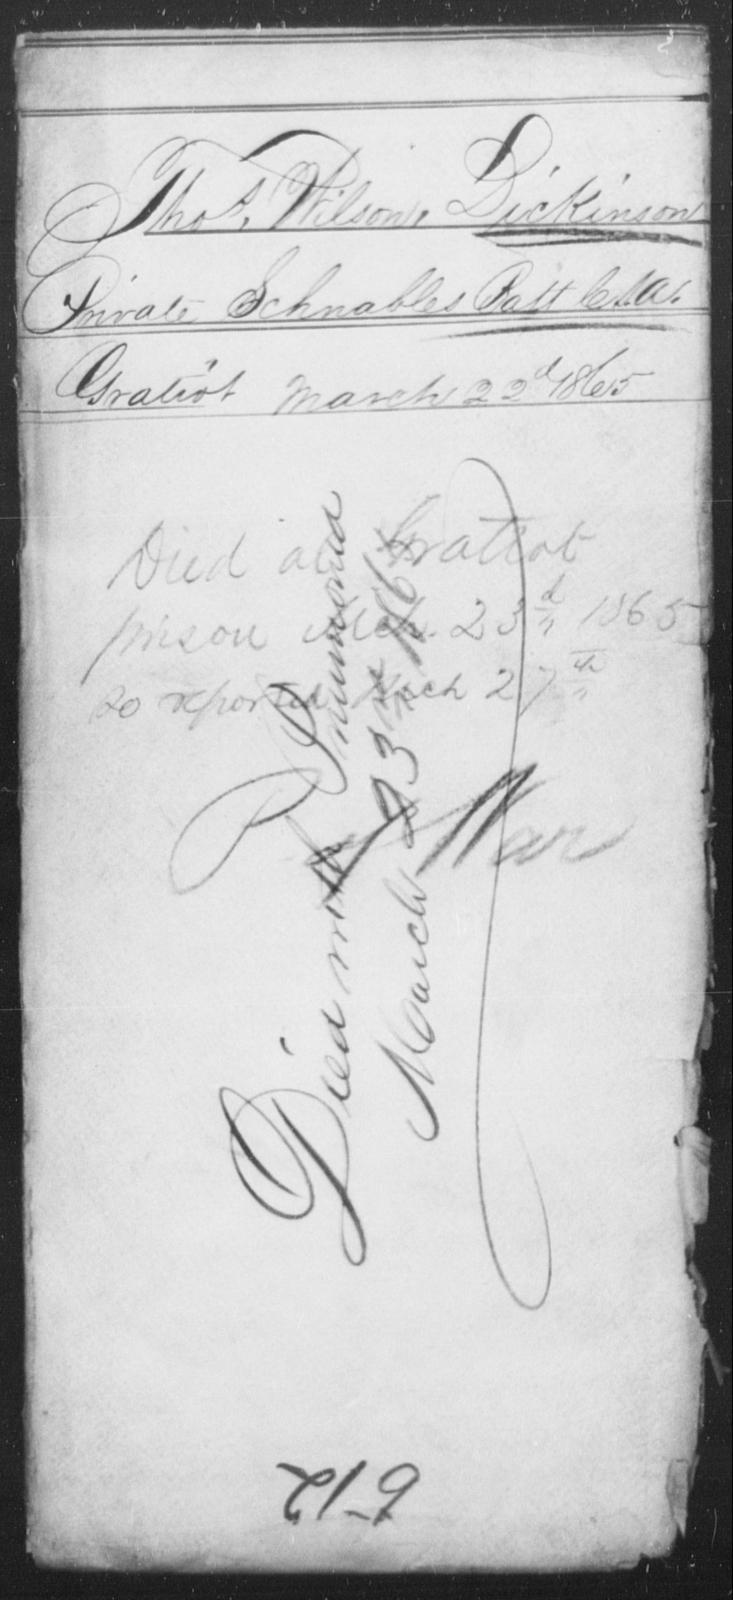 Dickinson, Thos Wilson - State: [Blank] - Year: 1865